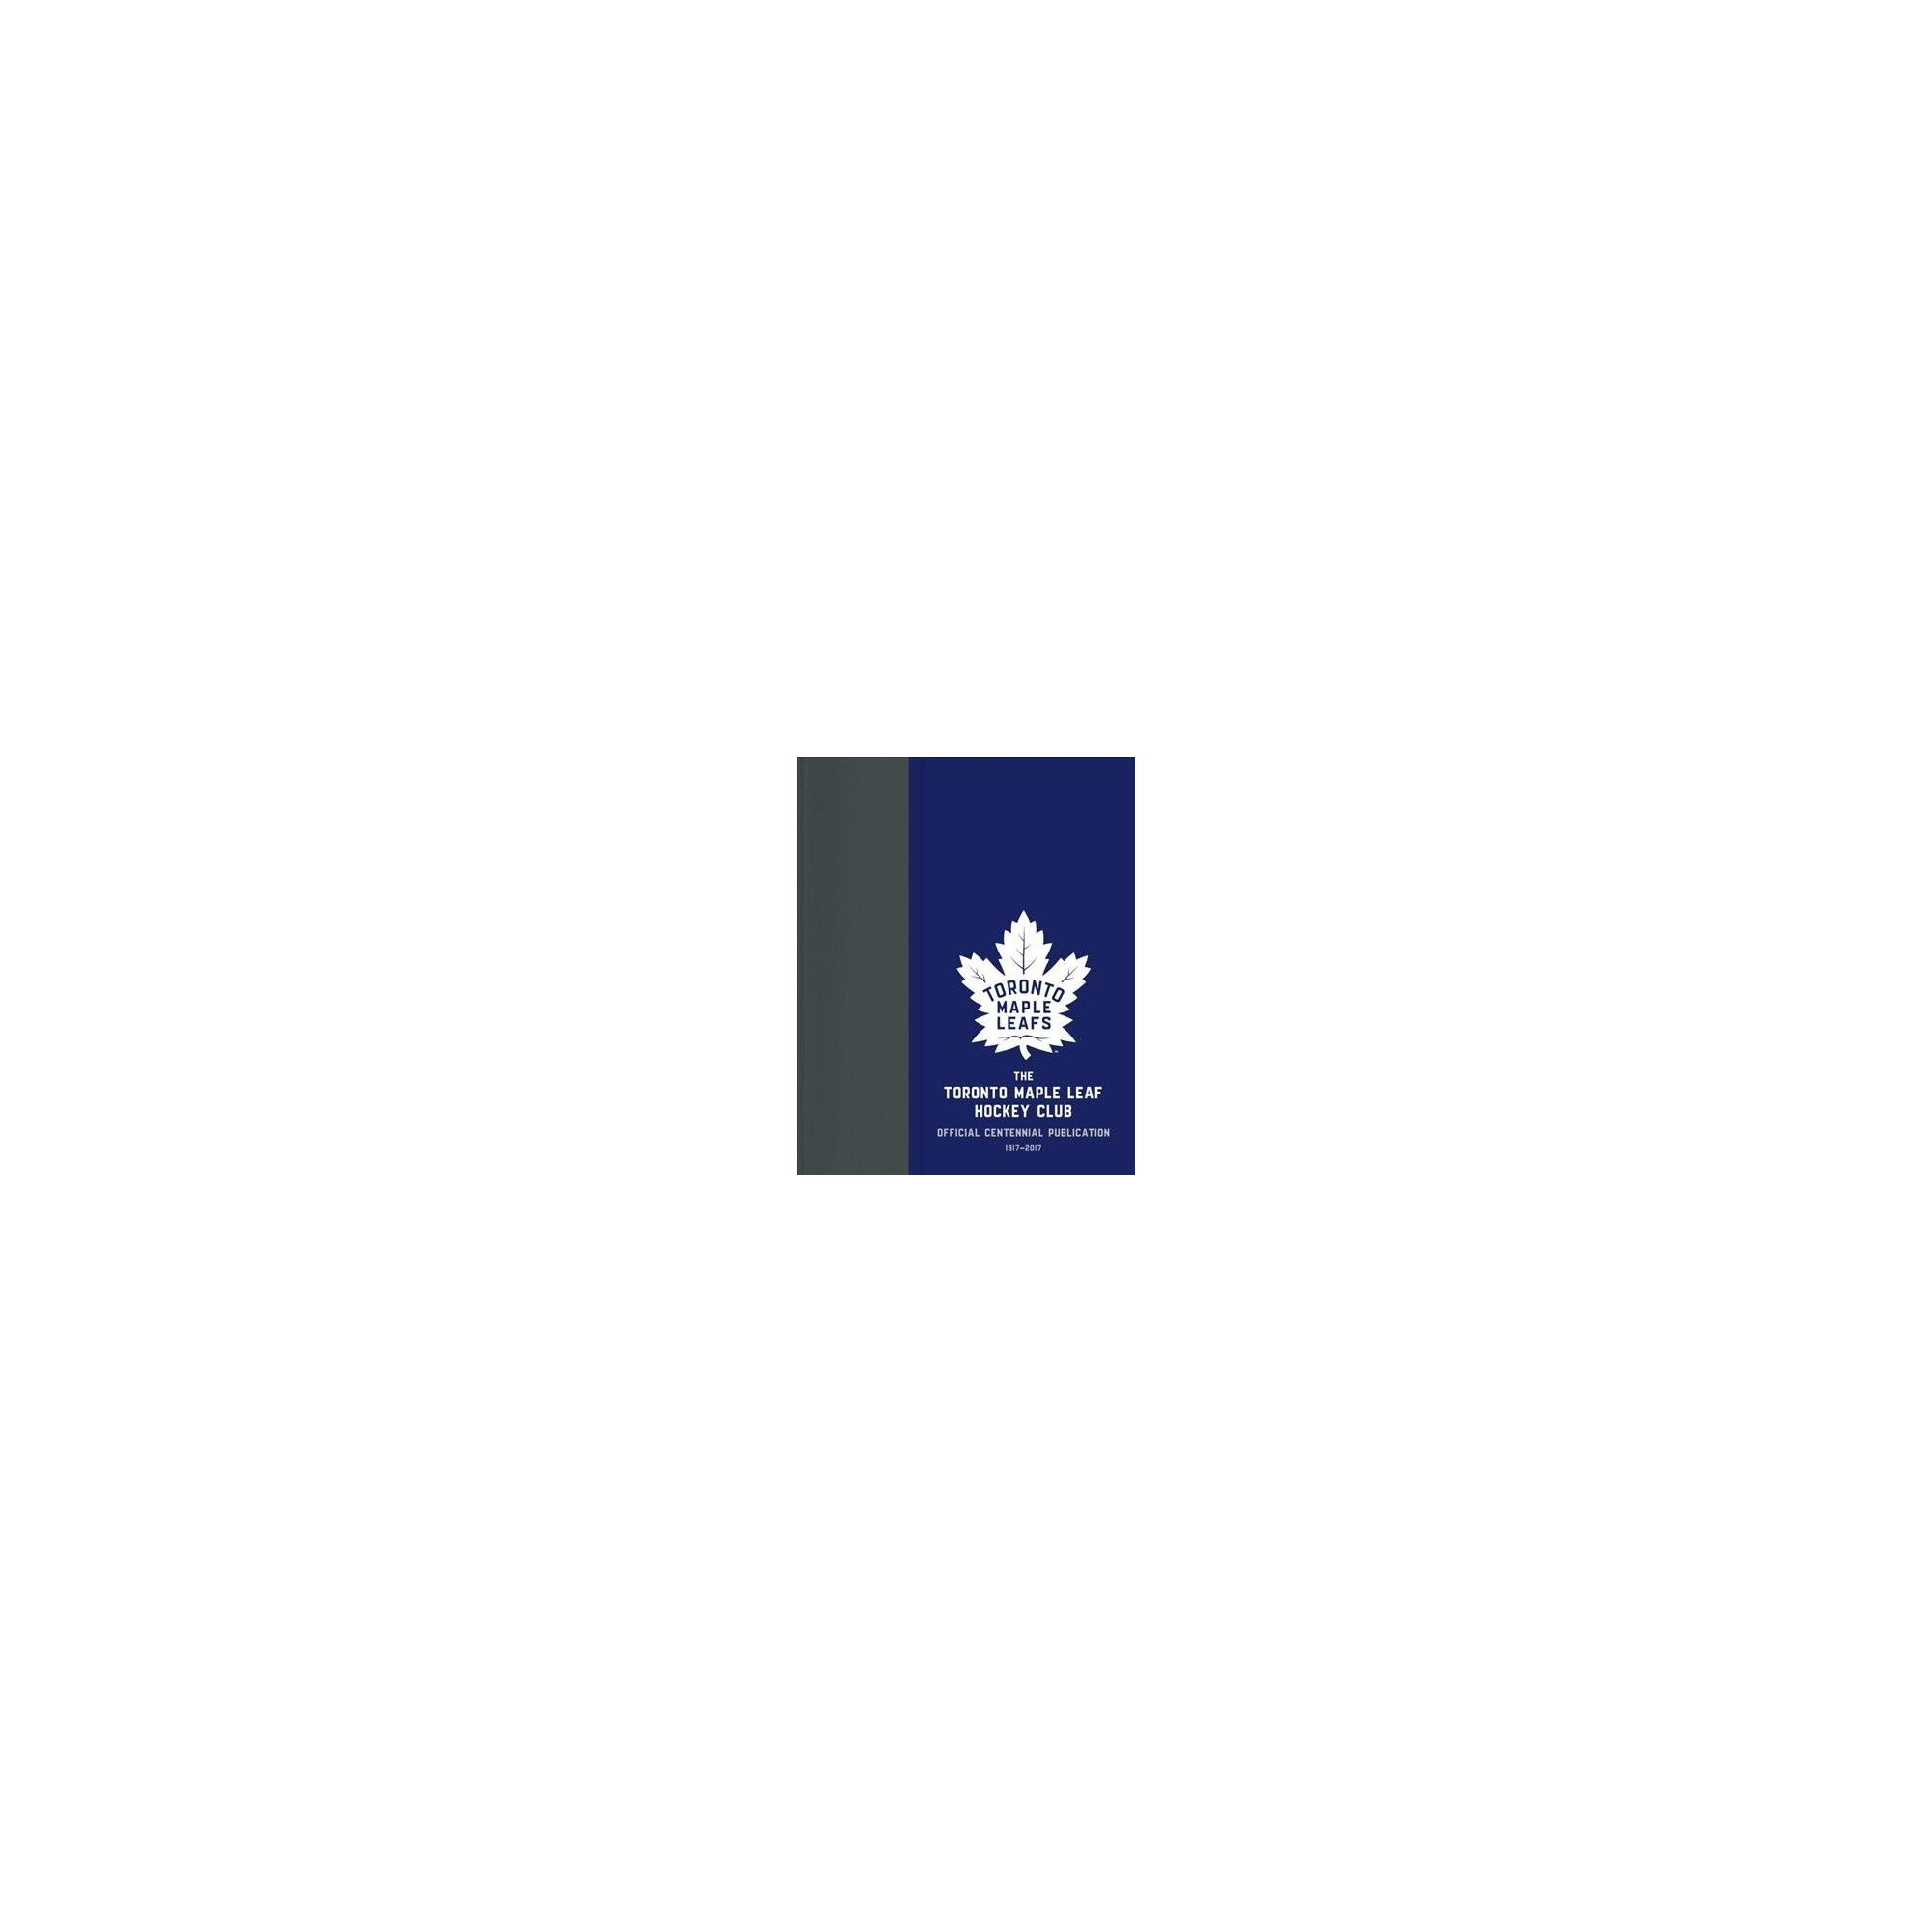 Toronto Maple Leaf Hockey Club Official Centennial Publication Hardcover Kevin Shea Toronto Maple